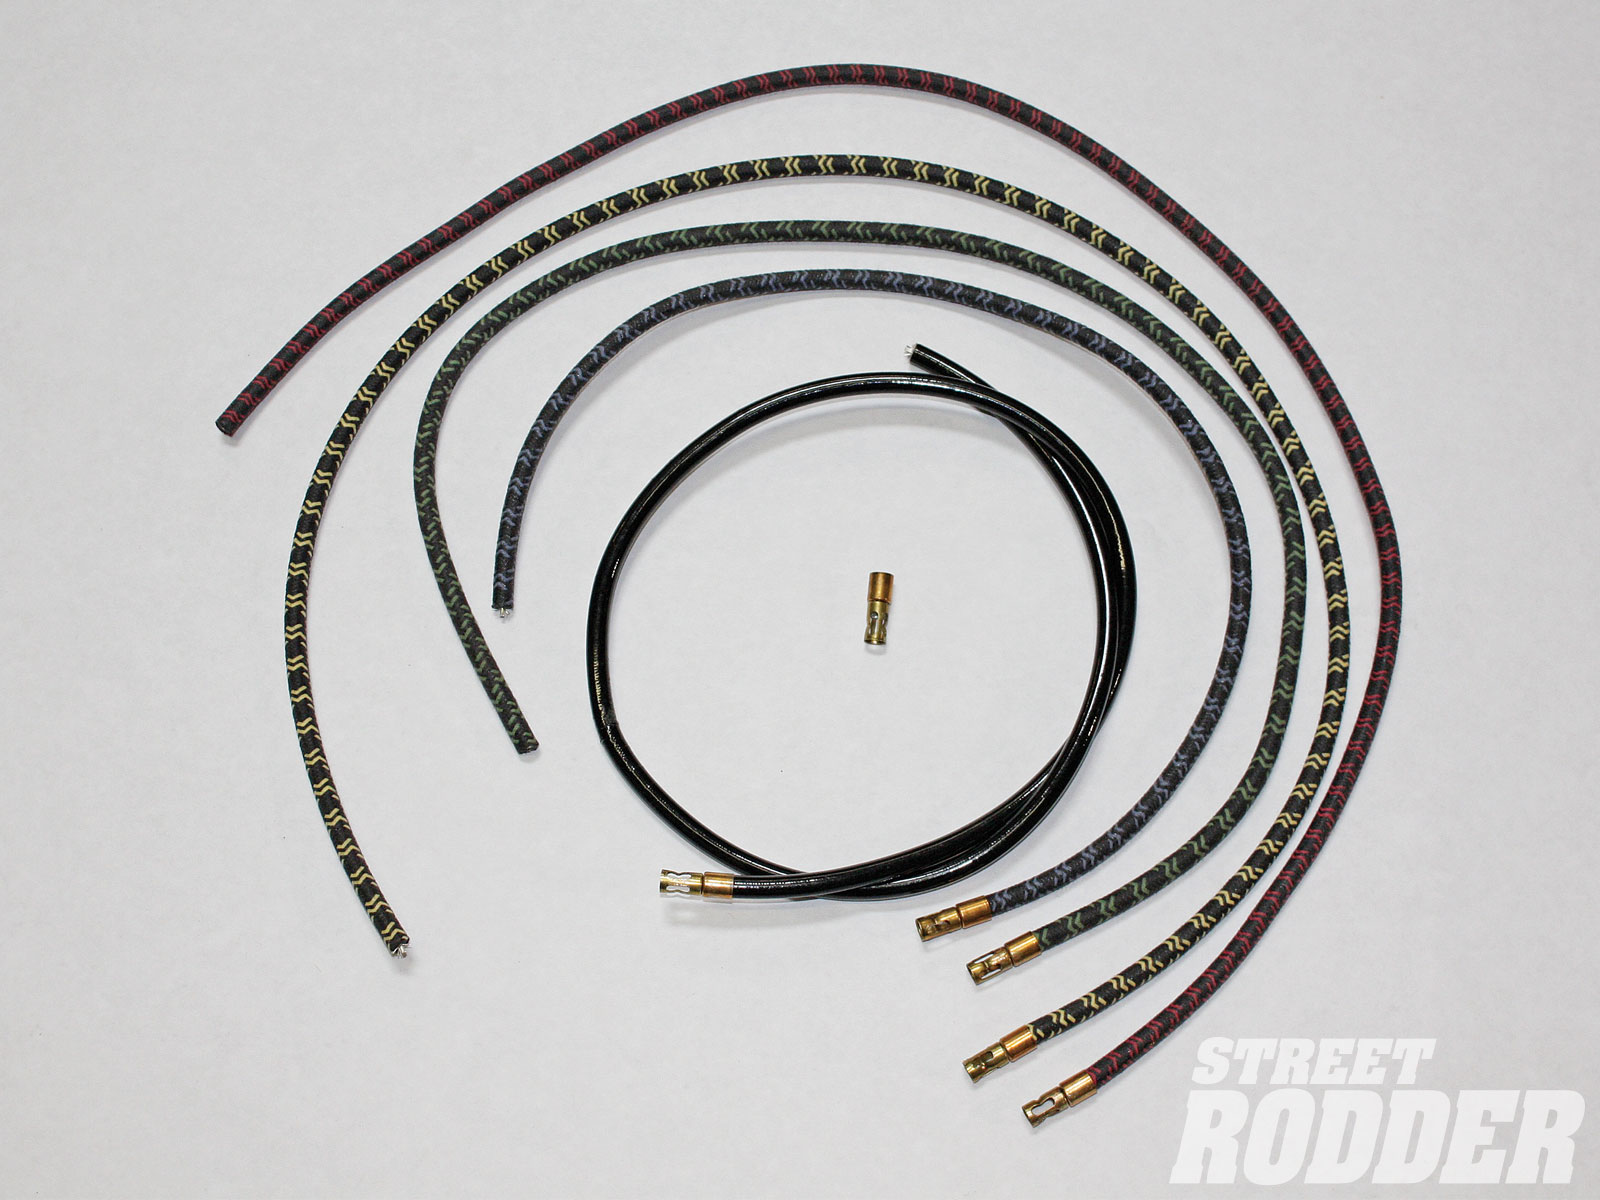 Hot Rod Wiring